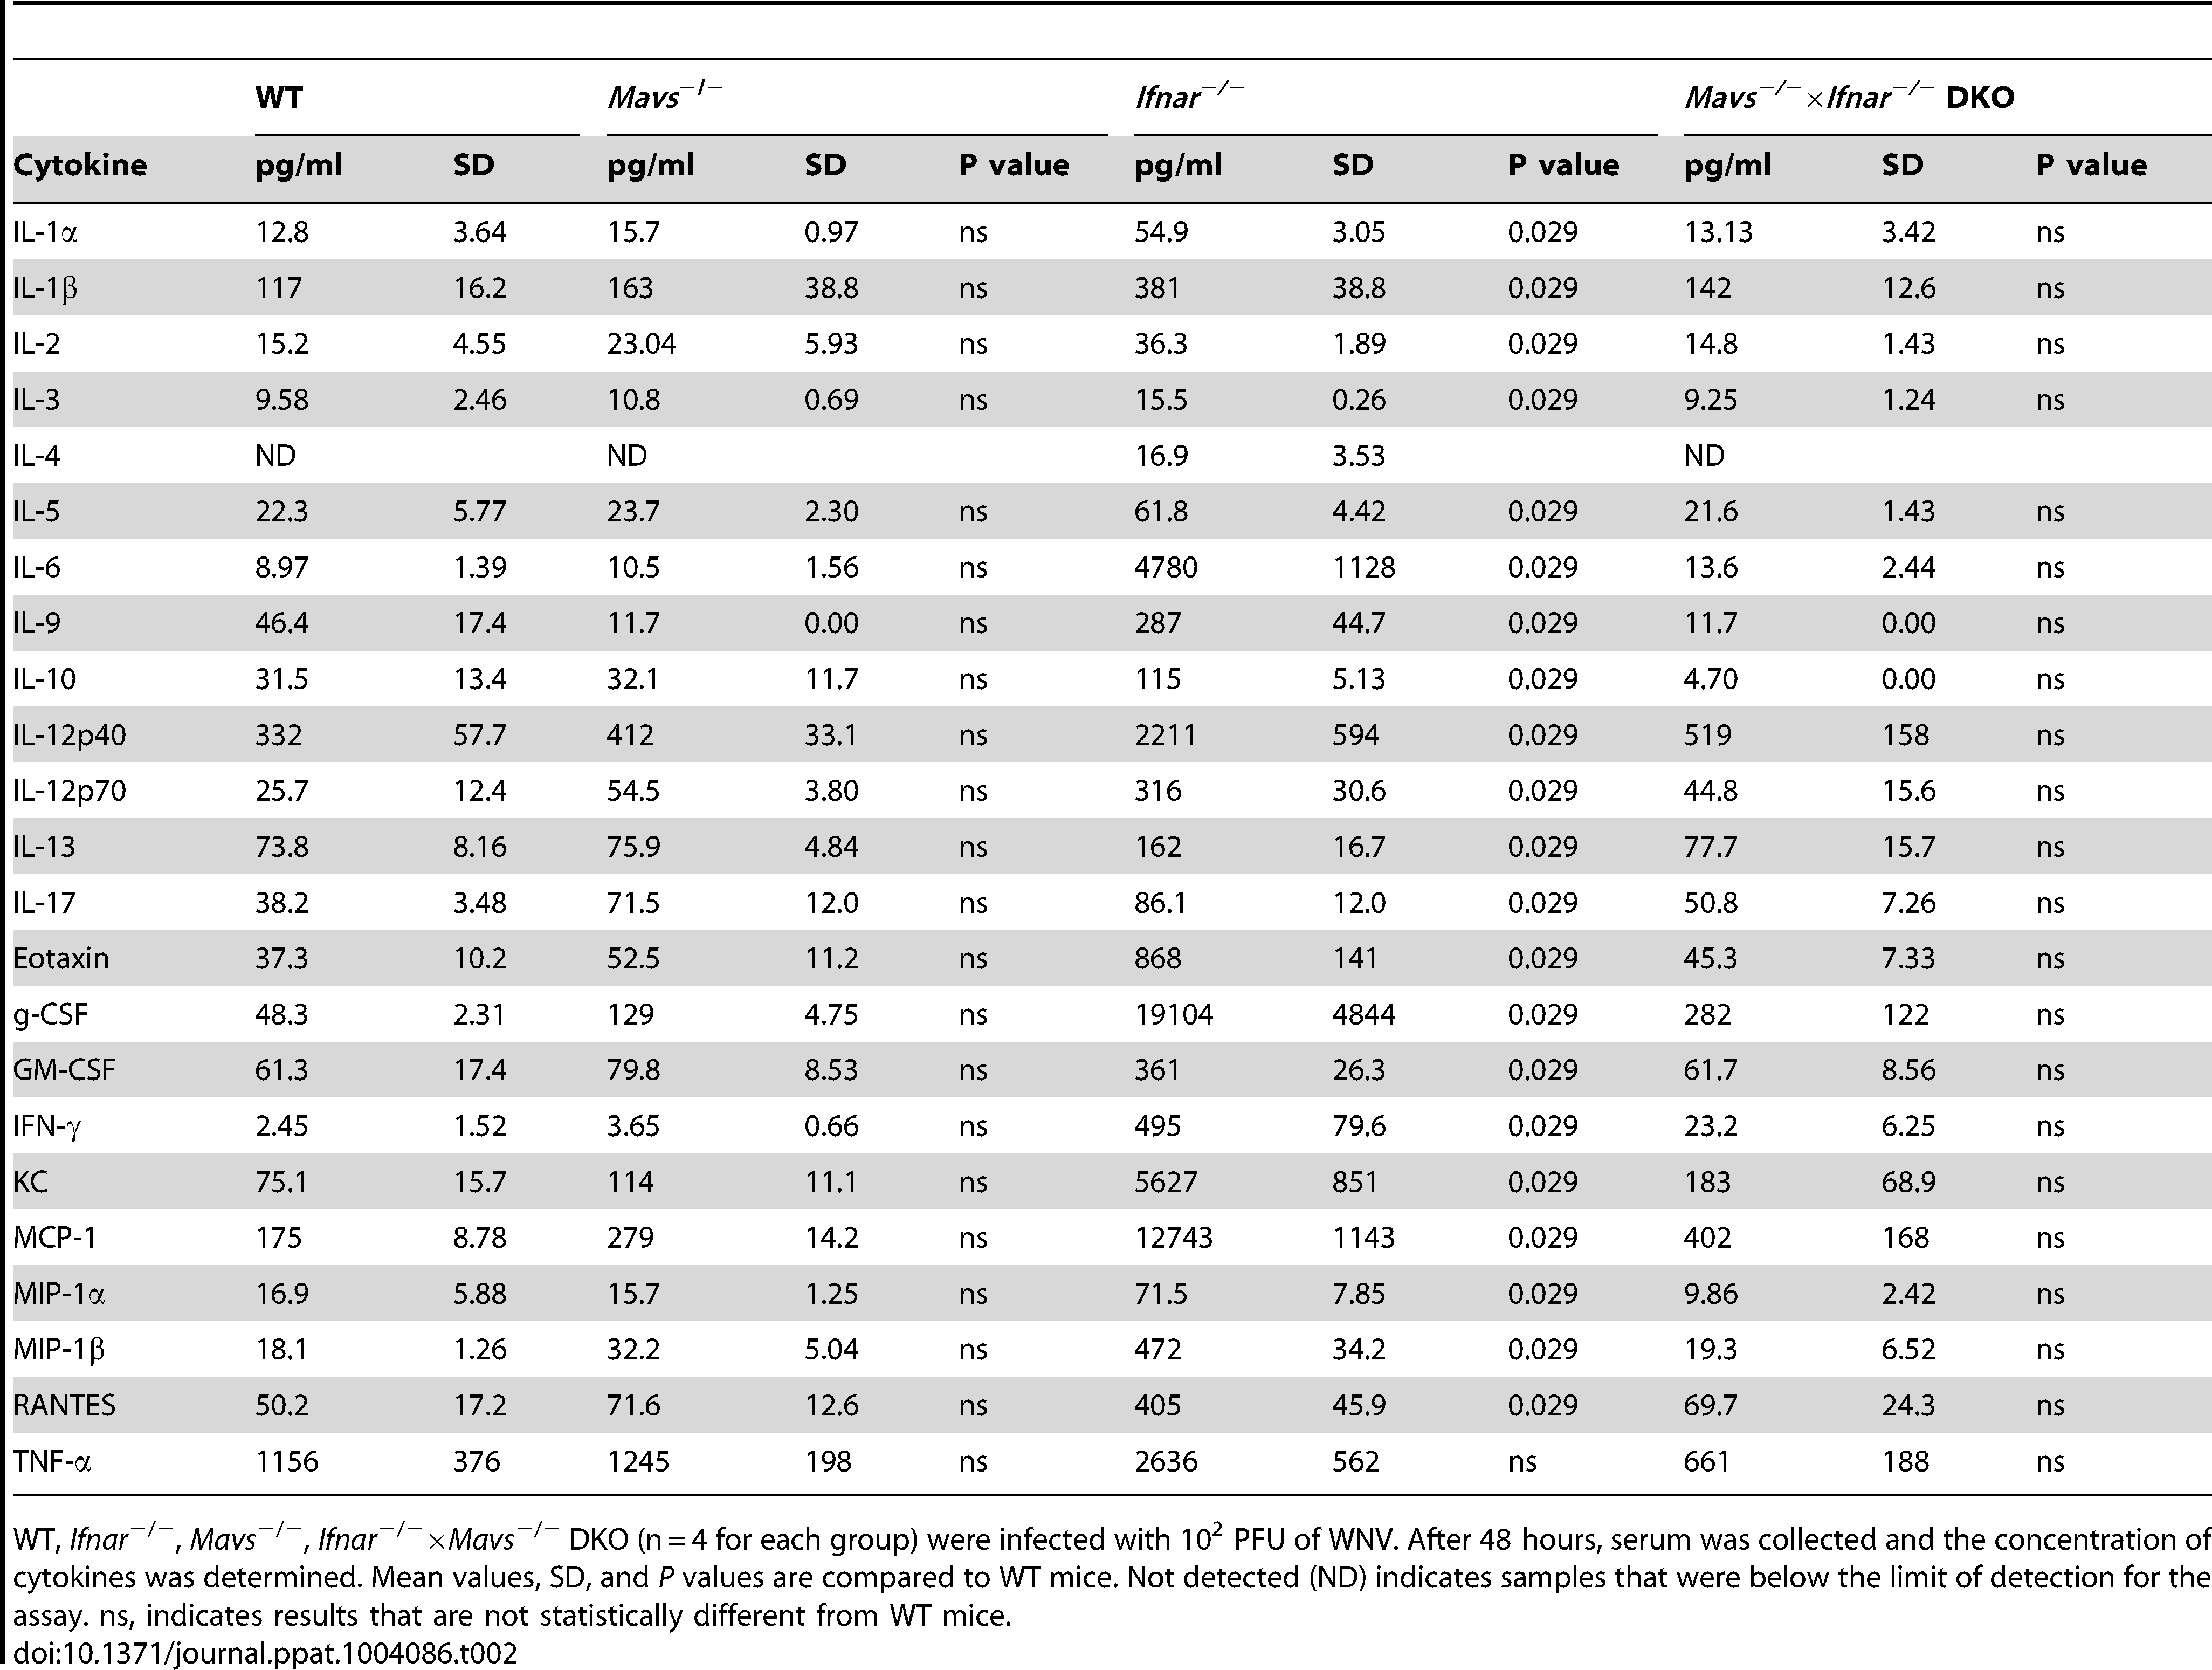 Cytokine and chemokine levels in serum of WNV-infected WT, <i>Mavs</i><sup>−/−</sup>, <i>Ifnar</i><sup>−/−</sup>, and <i>Mavs</i><sup>−/−</sup>×<i>Ifnar</i><sup>−/−</sup> DKO mice.